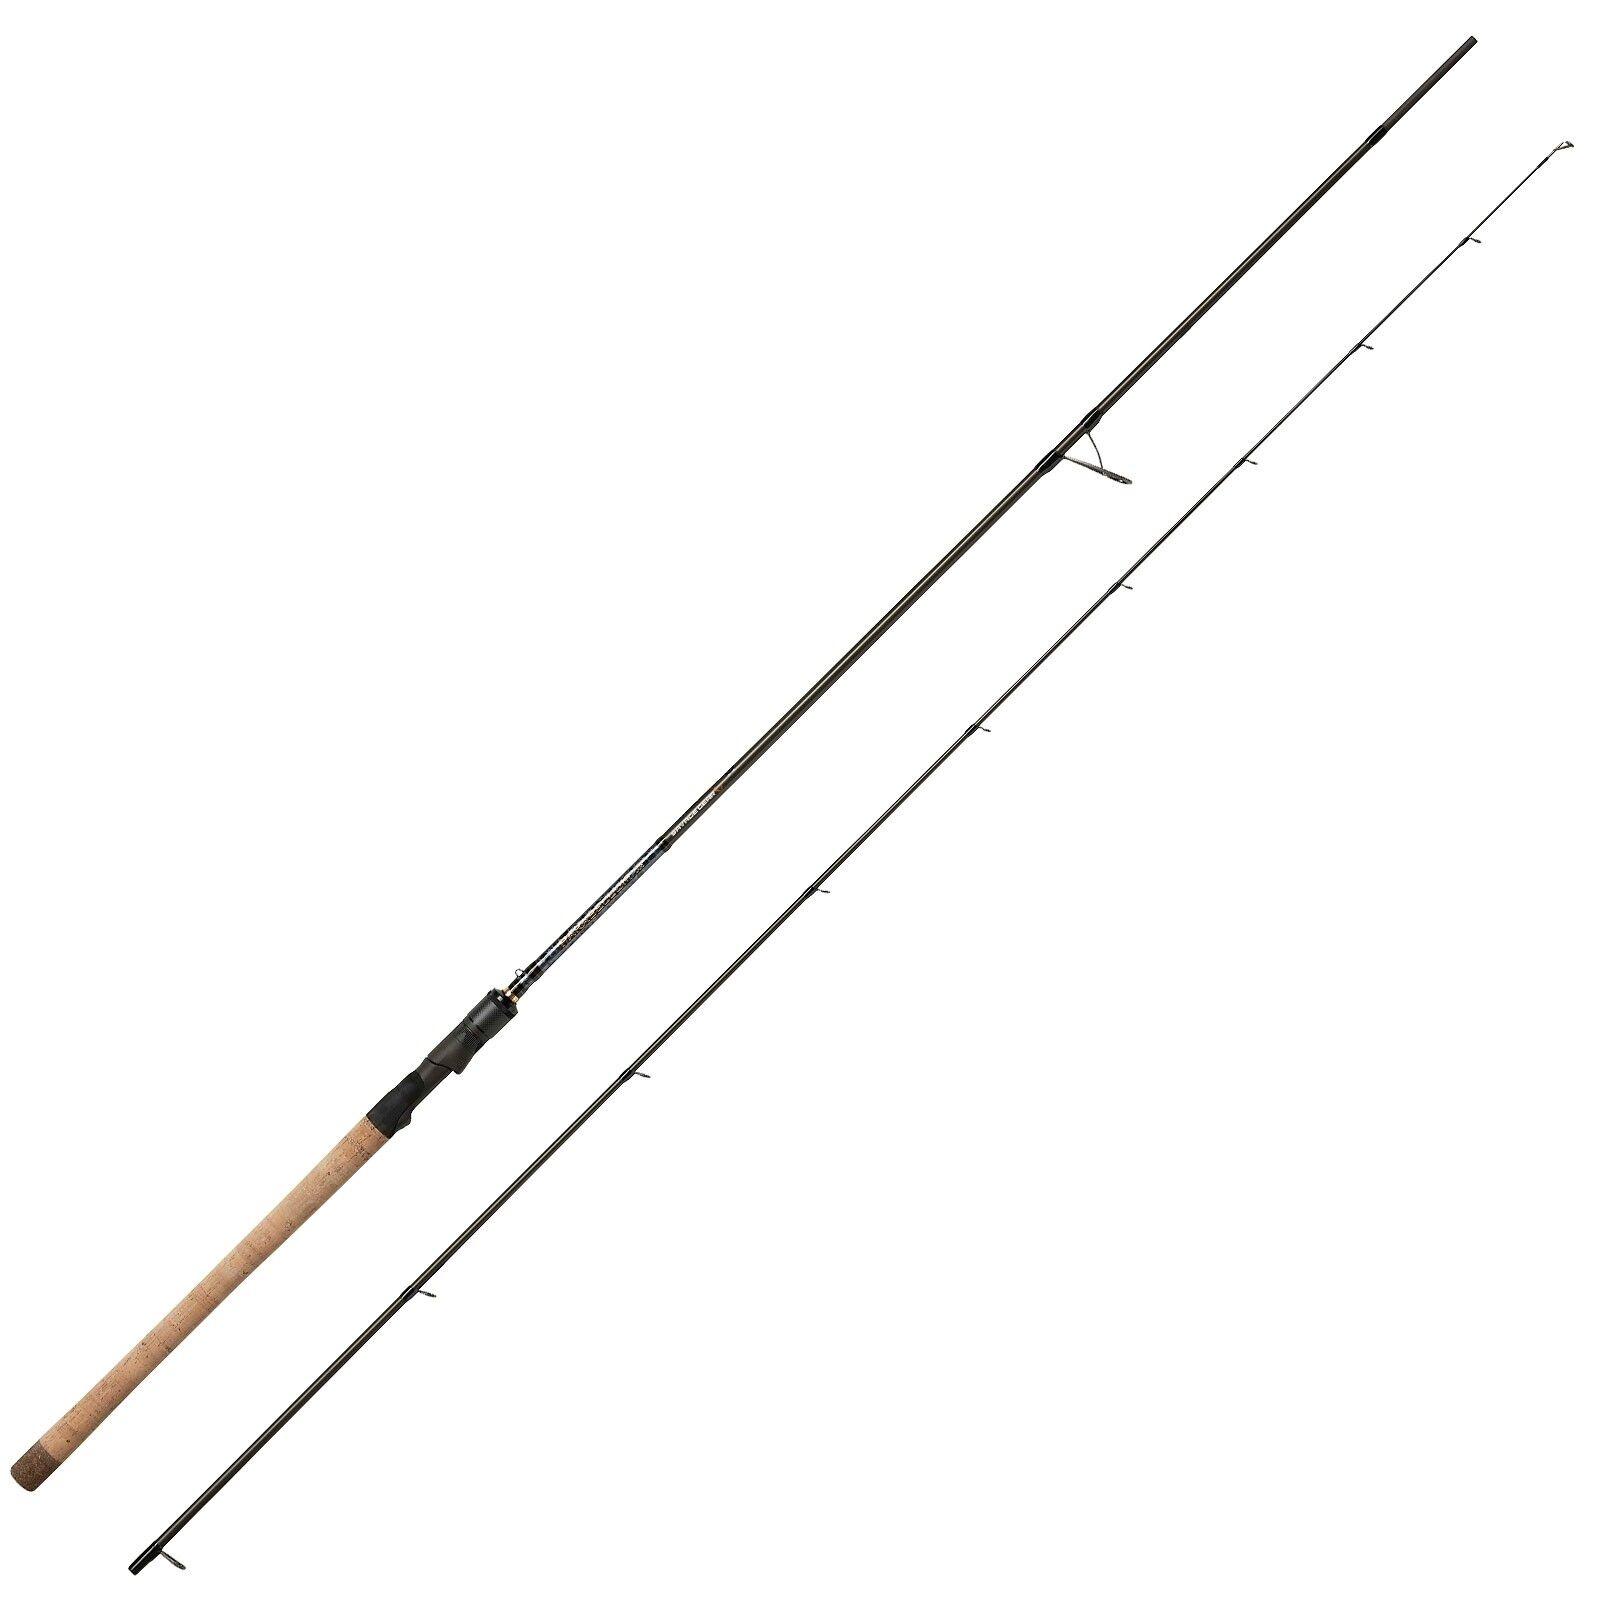 Savage Gear canna da pesca allroundrute – Parabellum CCS 2,79m 10-30g 2 pezzi